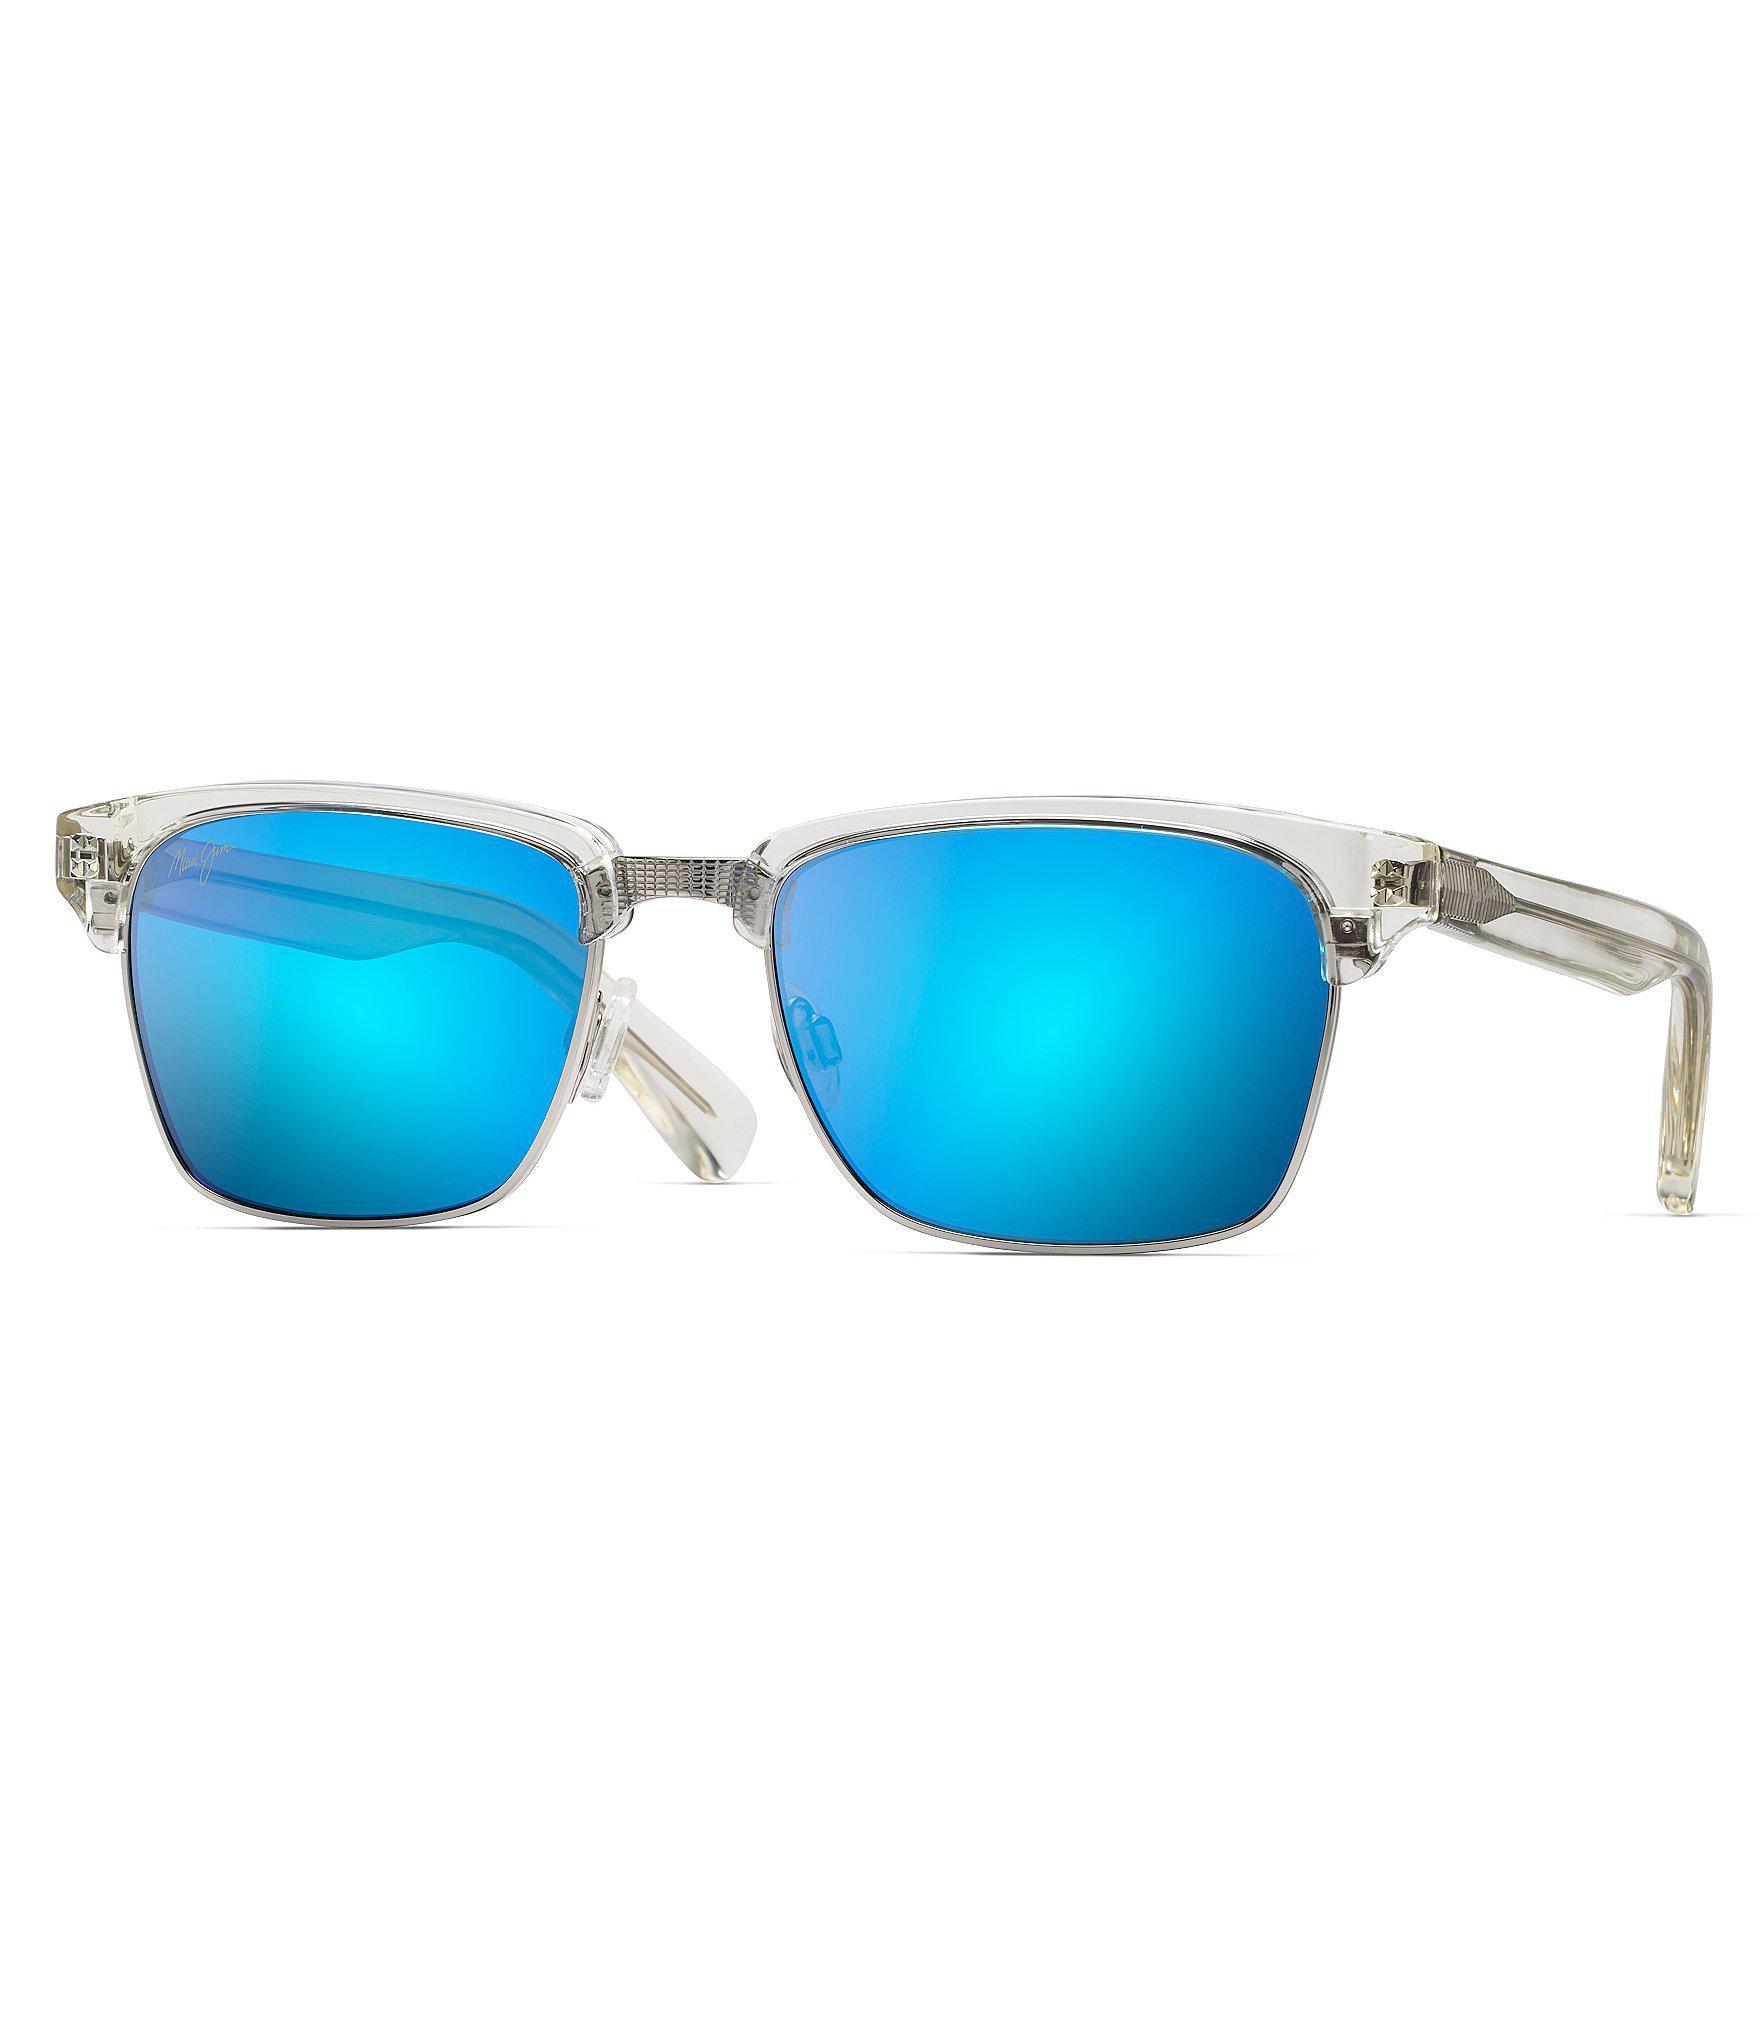 d08c2391b46 Lyst - Maui Jim Kawika Crystal Polarized Sunglasses in Blue for Men